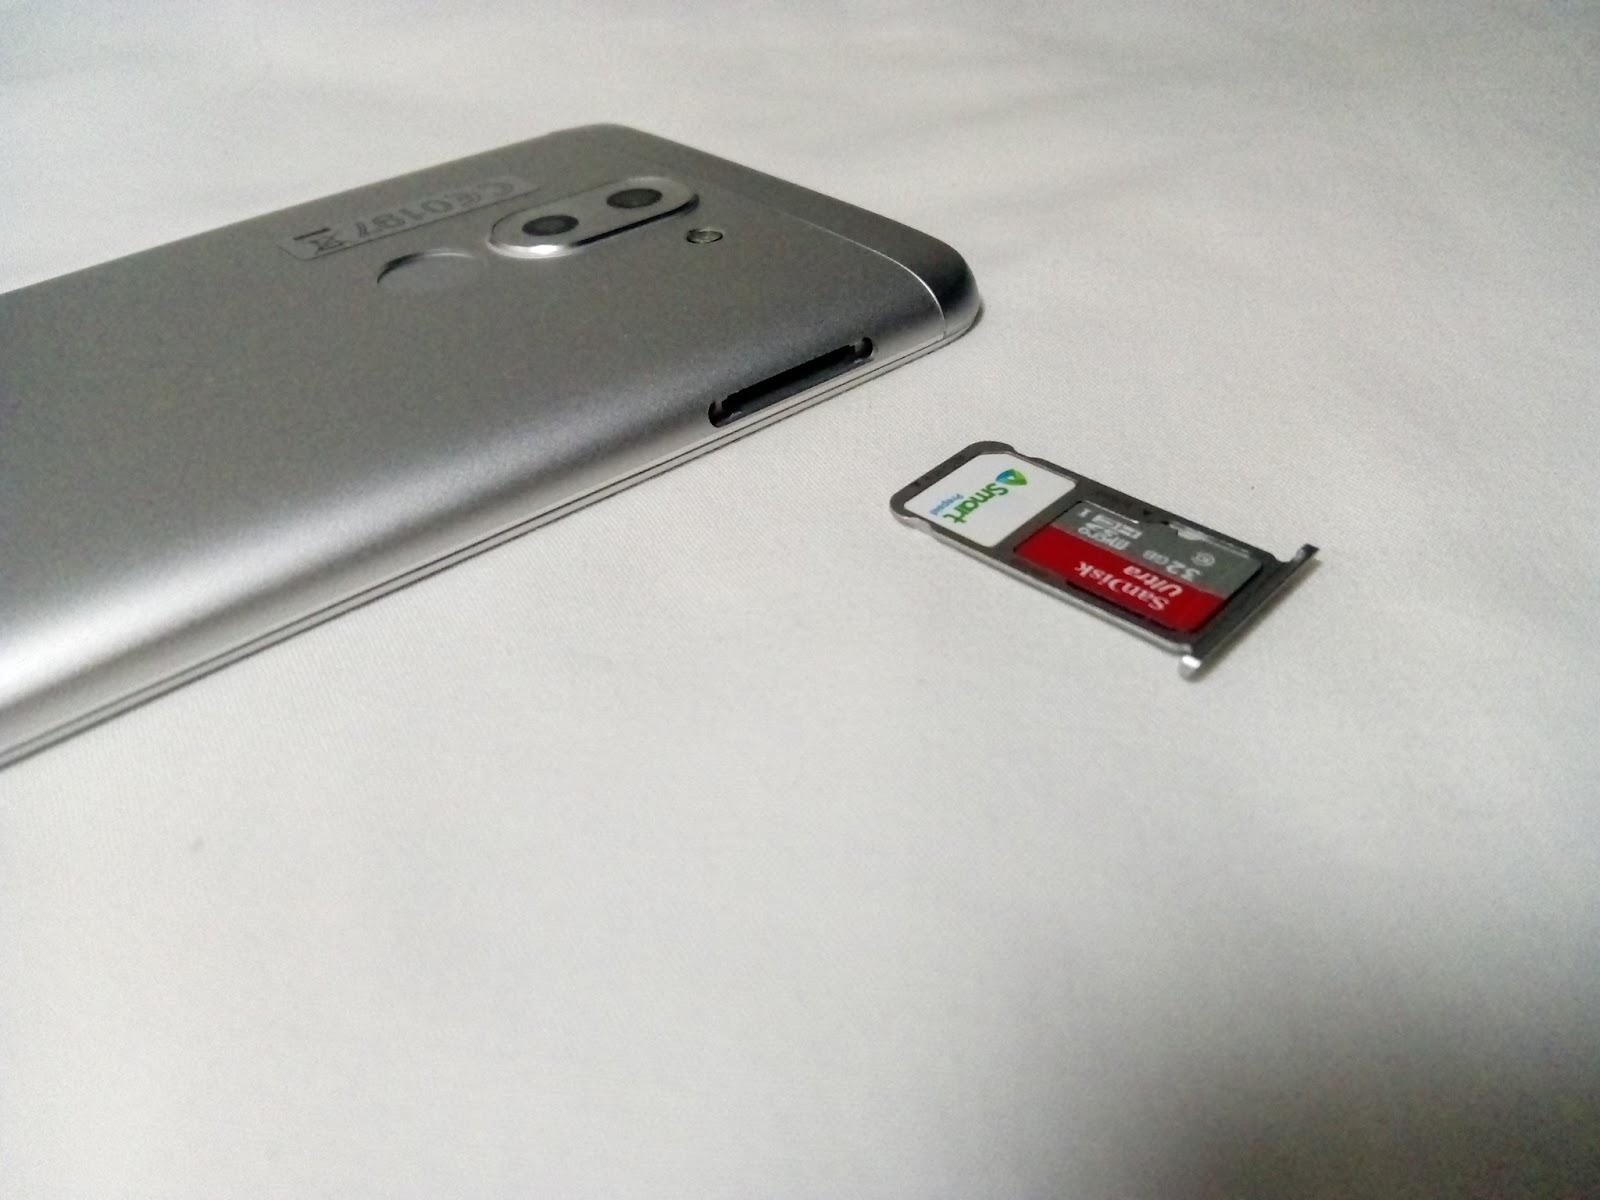 Huawei gr5 sd card